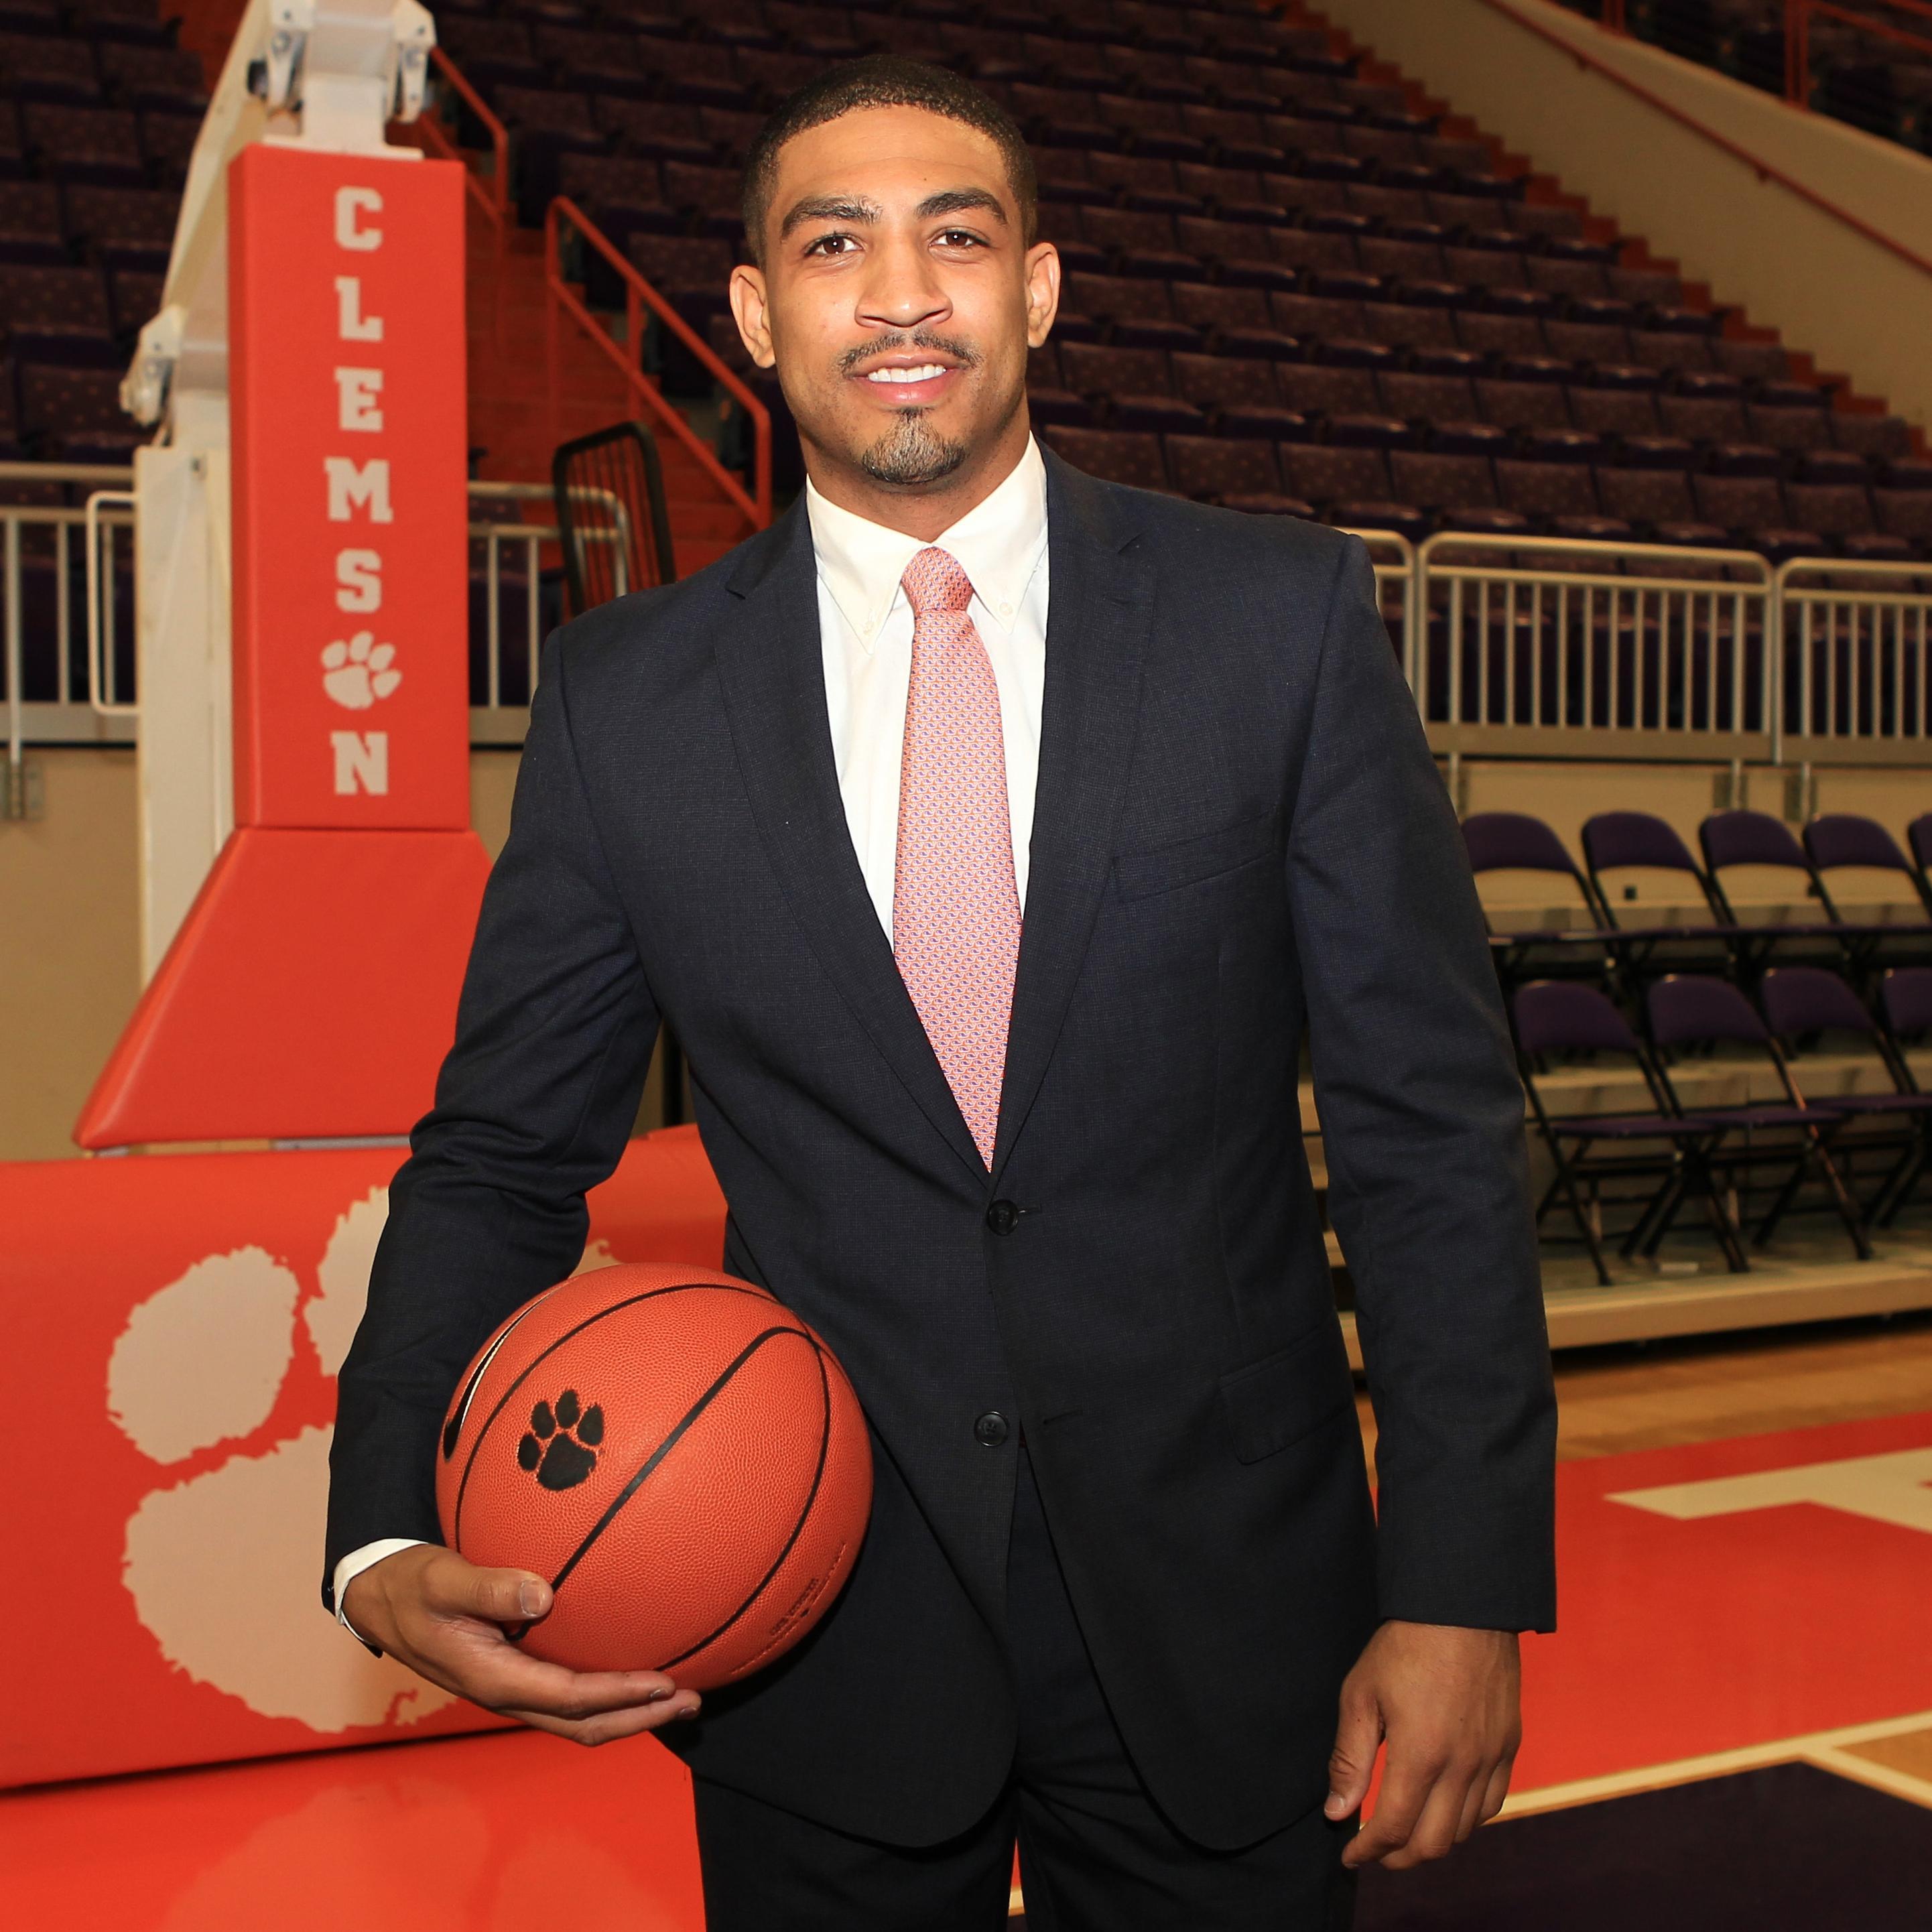 Clemson Grads Abundant in College Basketball